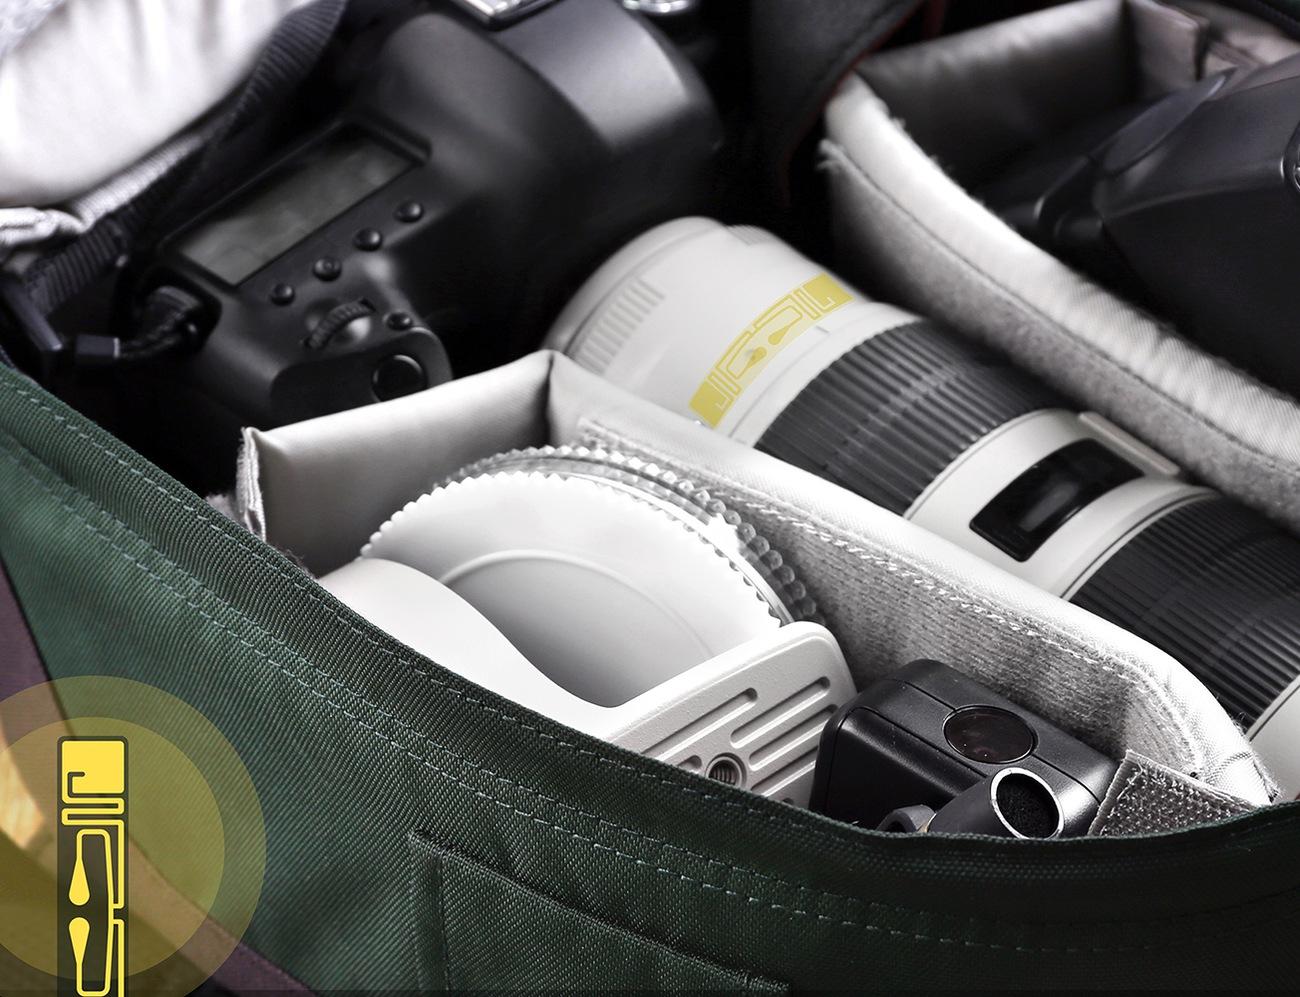 GearEye Gear Management System